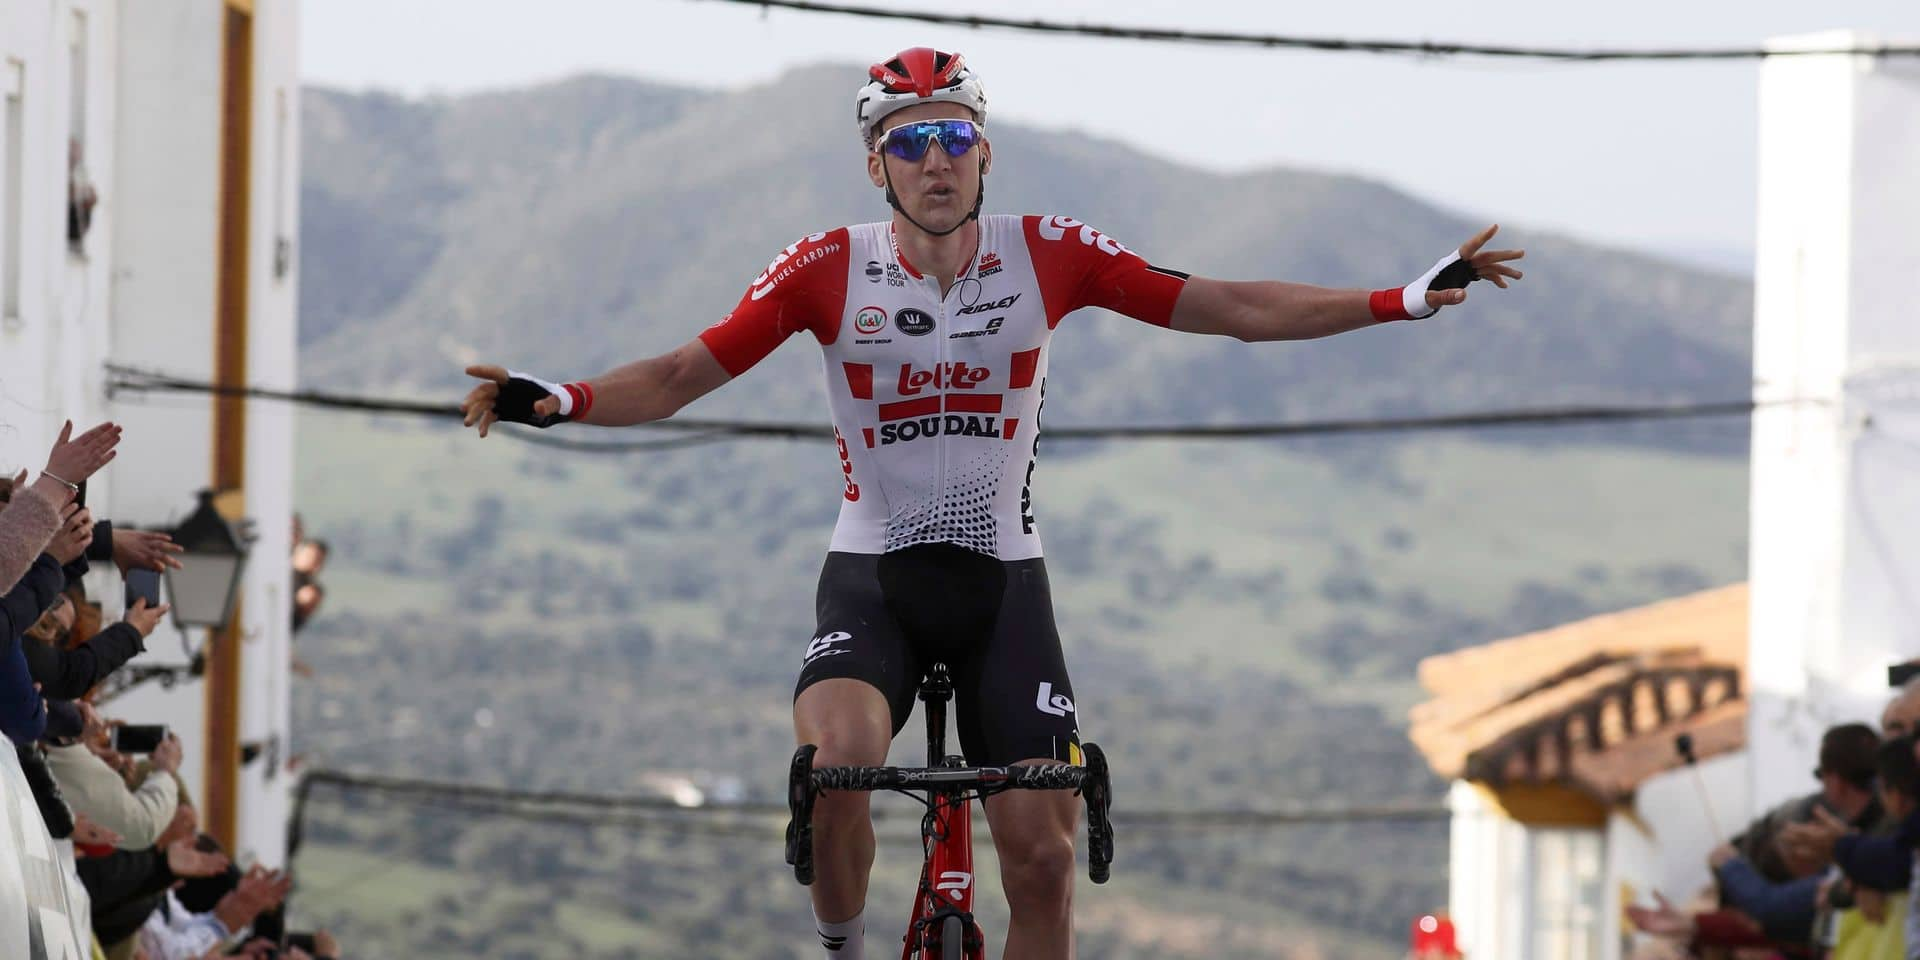 Vuelta a Andalucia Ruta Ciclista Del Sol 2019 stage-1